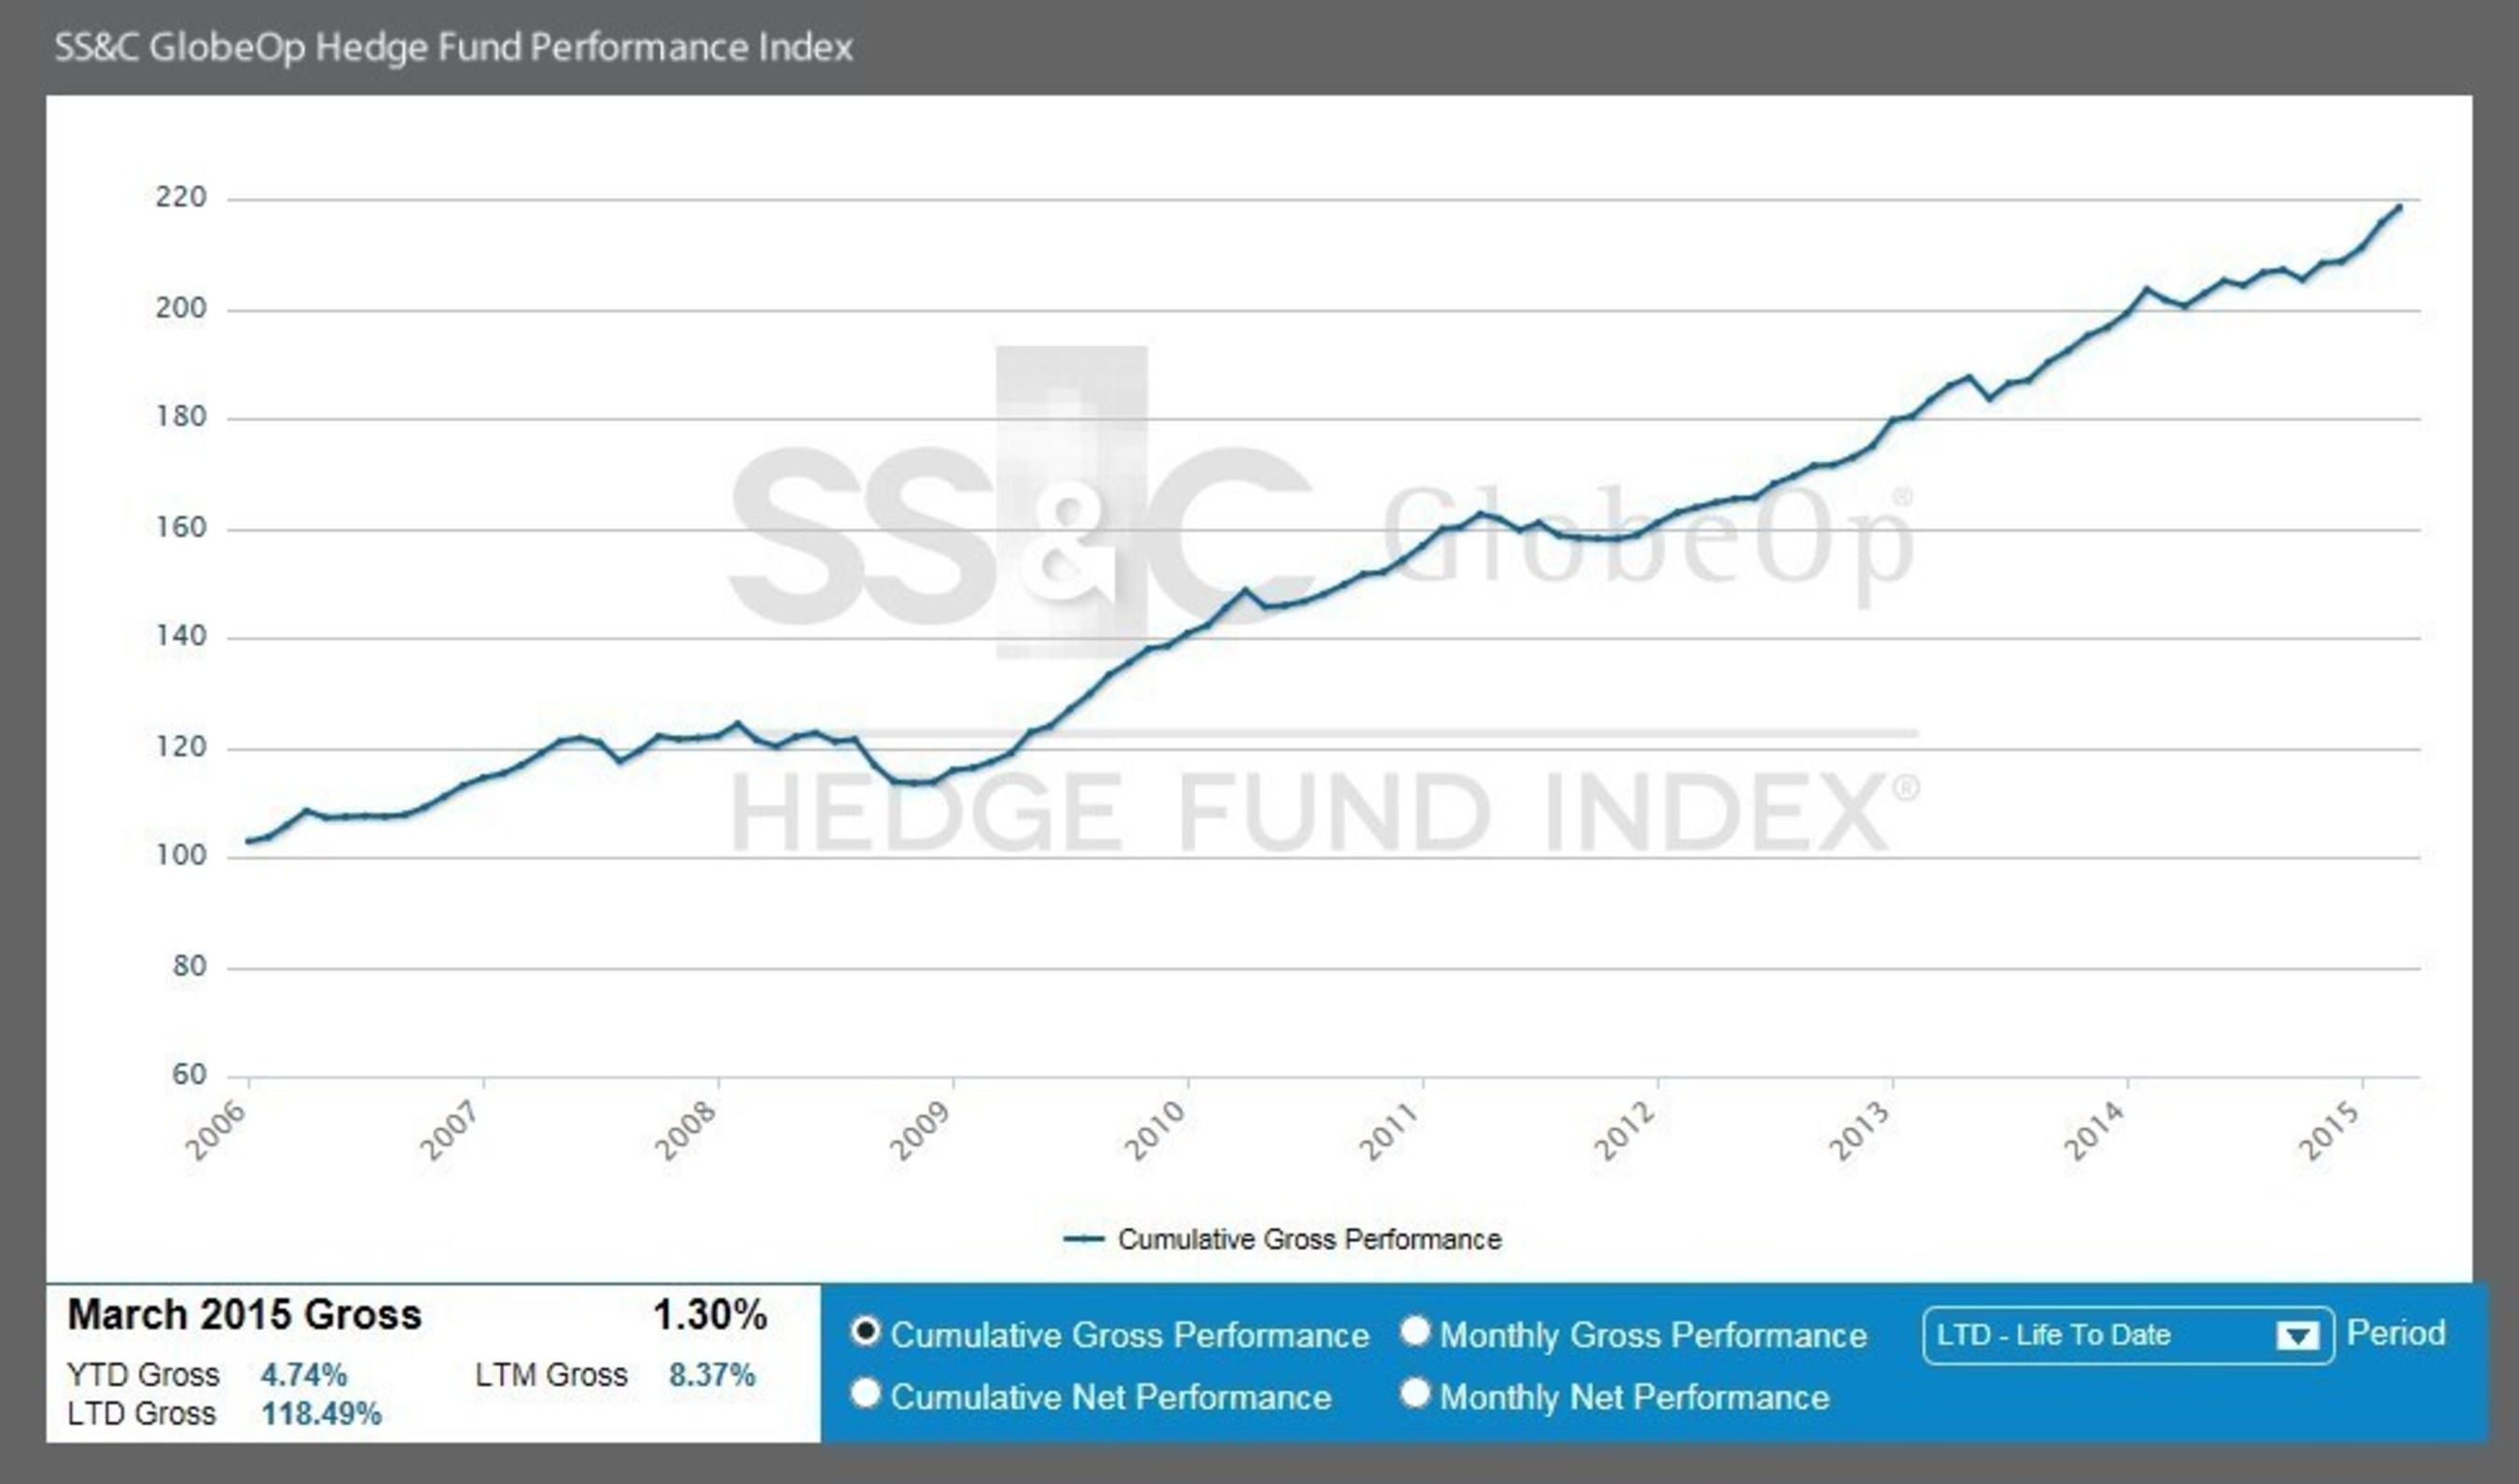 SS&C GlobeOp Hedge Fund Performance Index